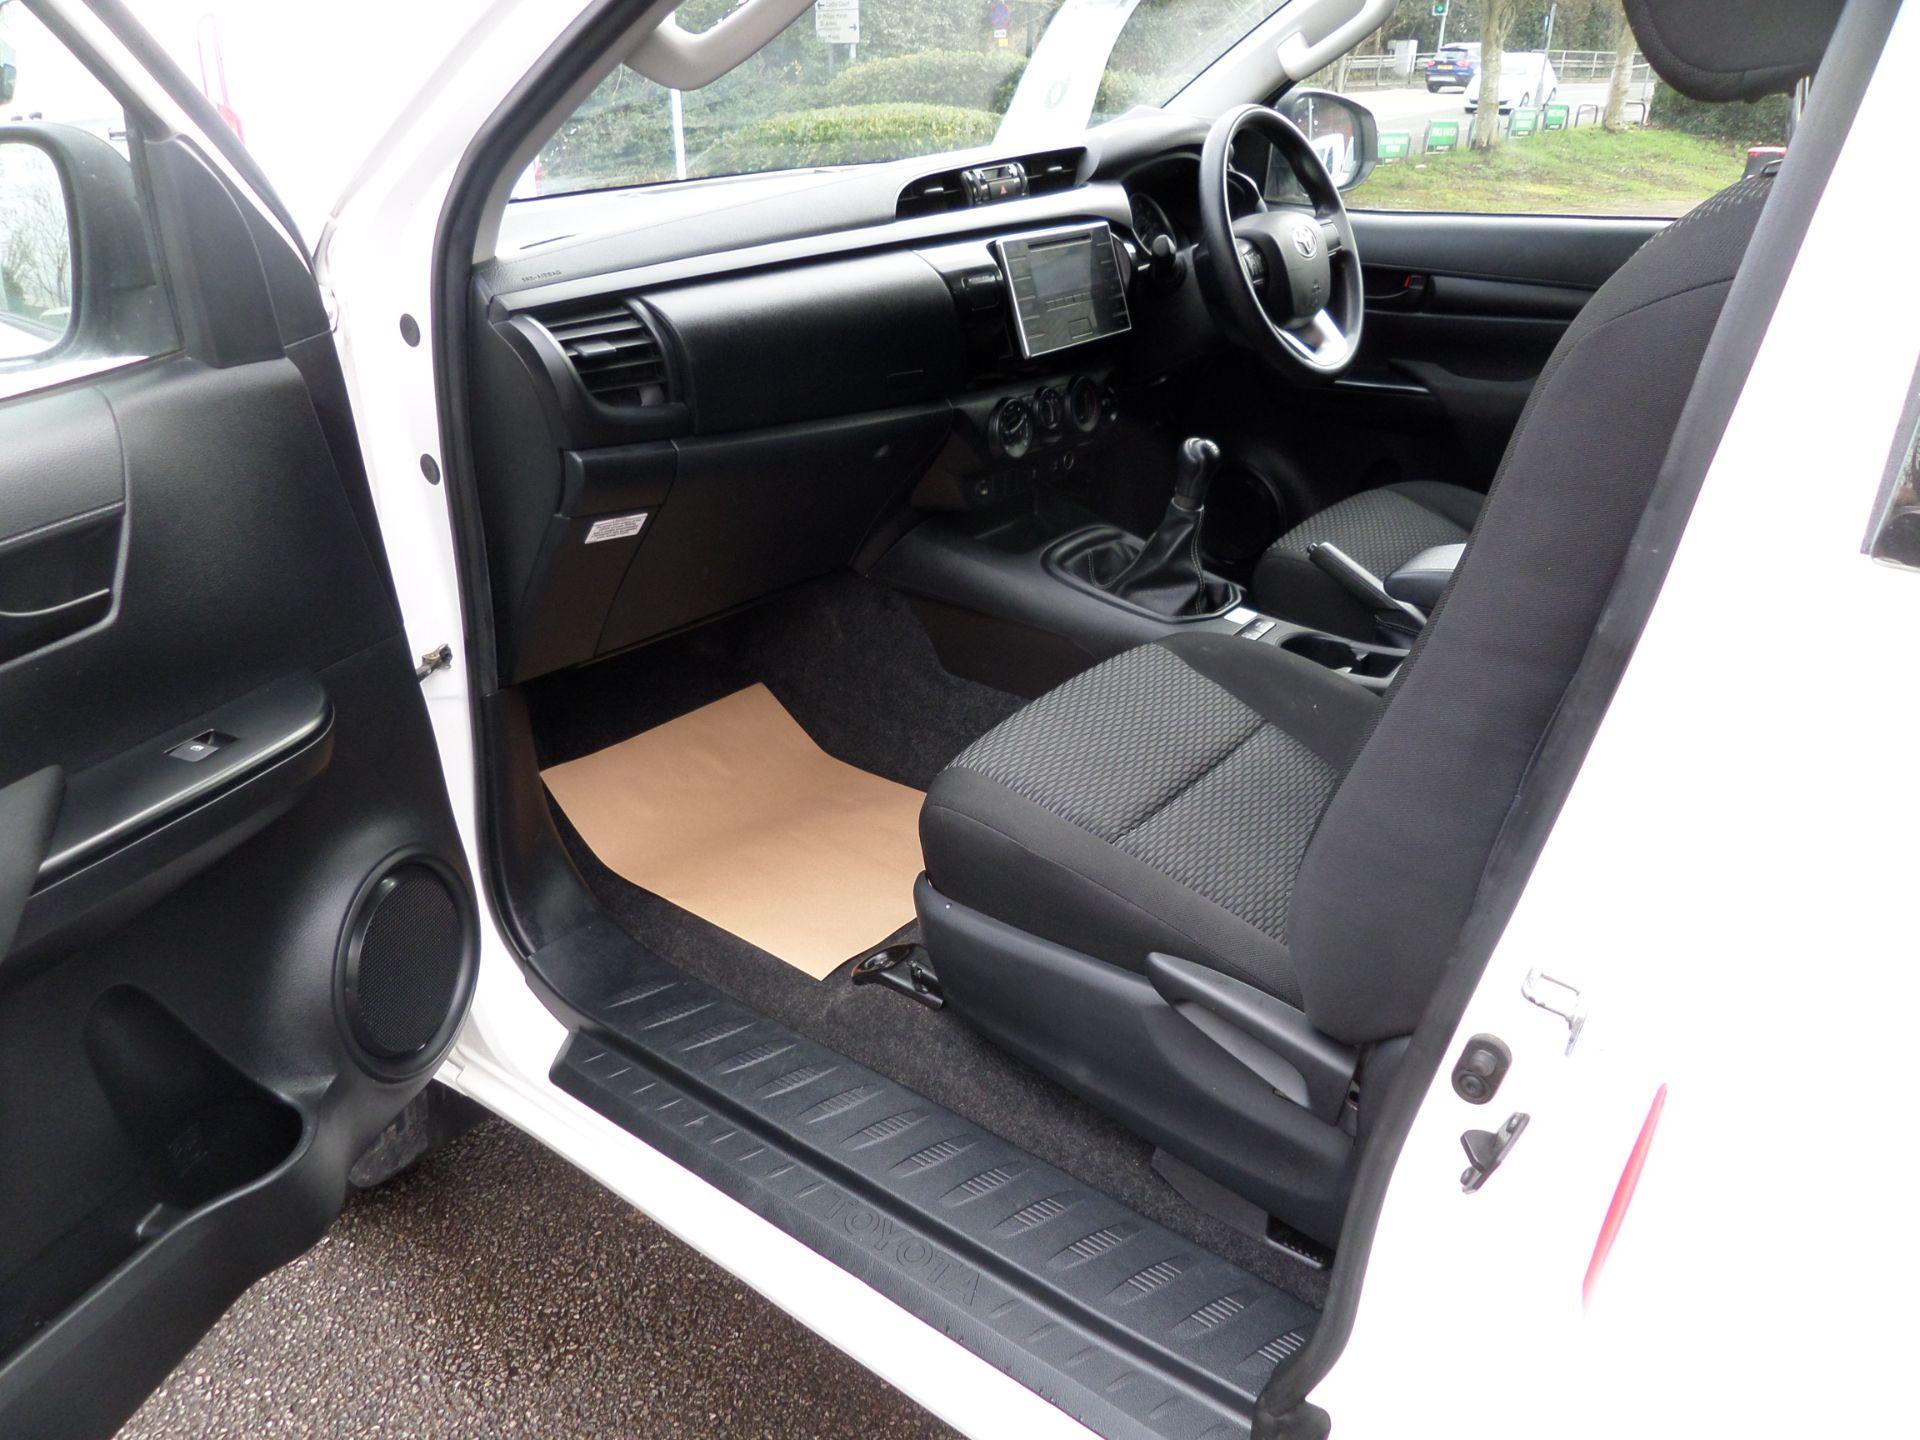 2017 Toyota Hilux Active Extra Long Double Cab Pick Up 2.4 D-4D Euro 6 (NU17RSO) Image 11